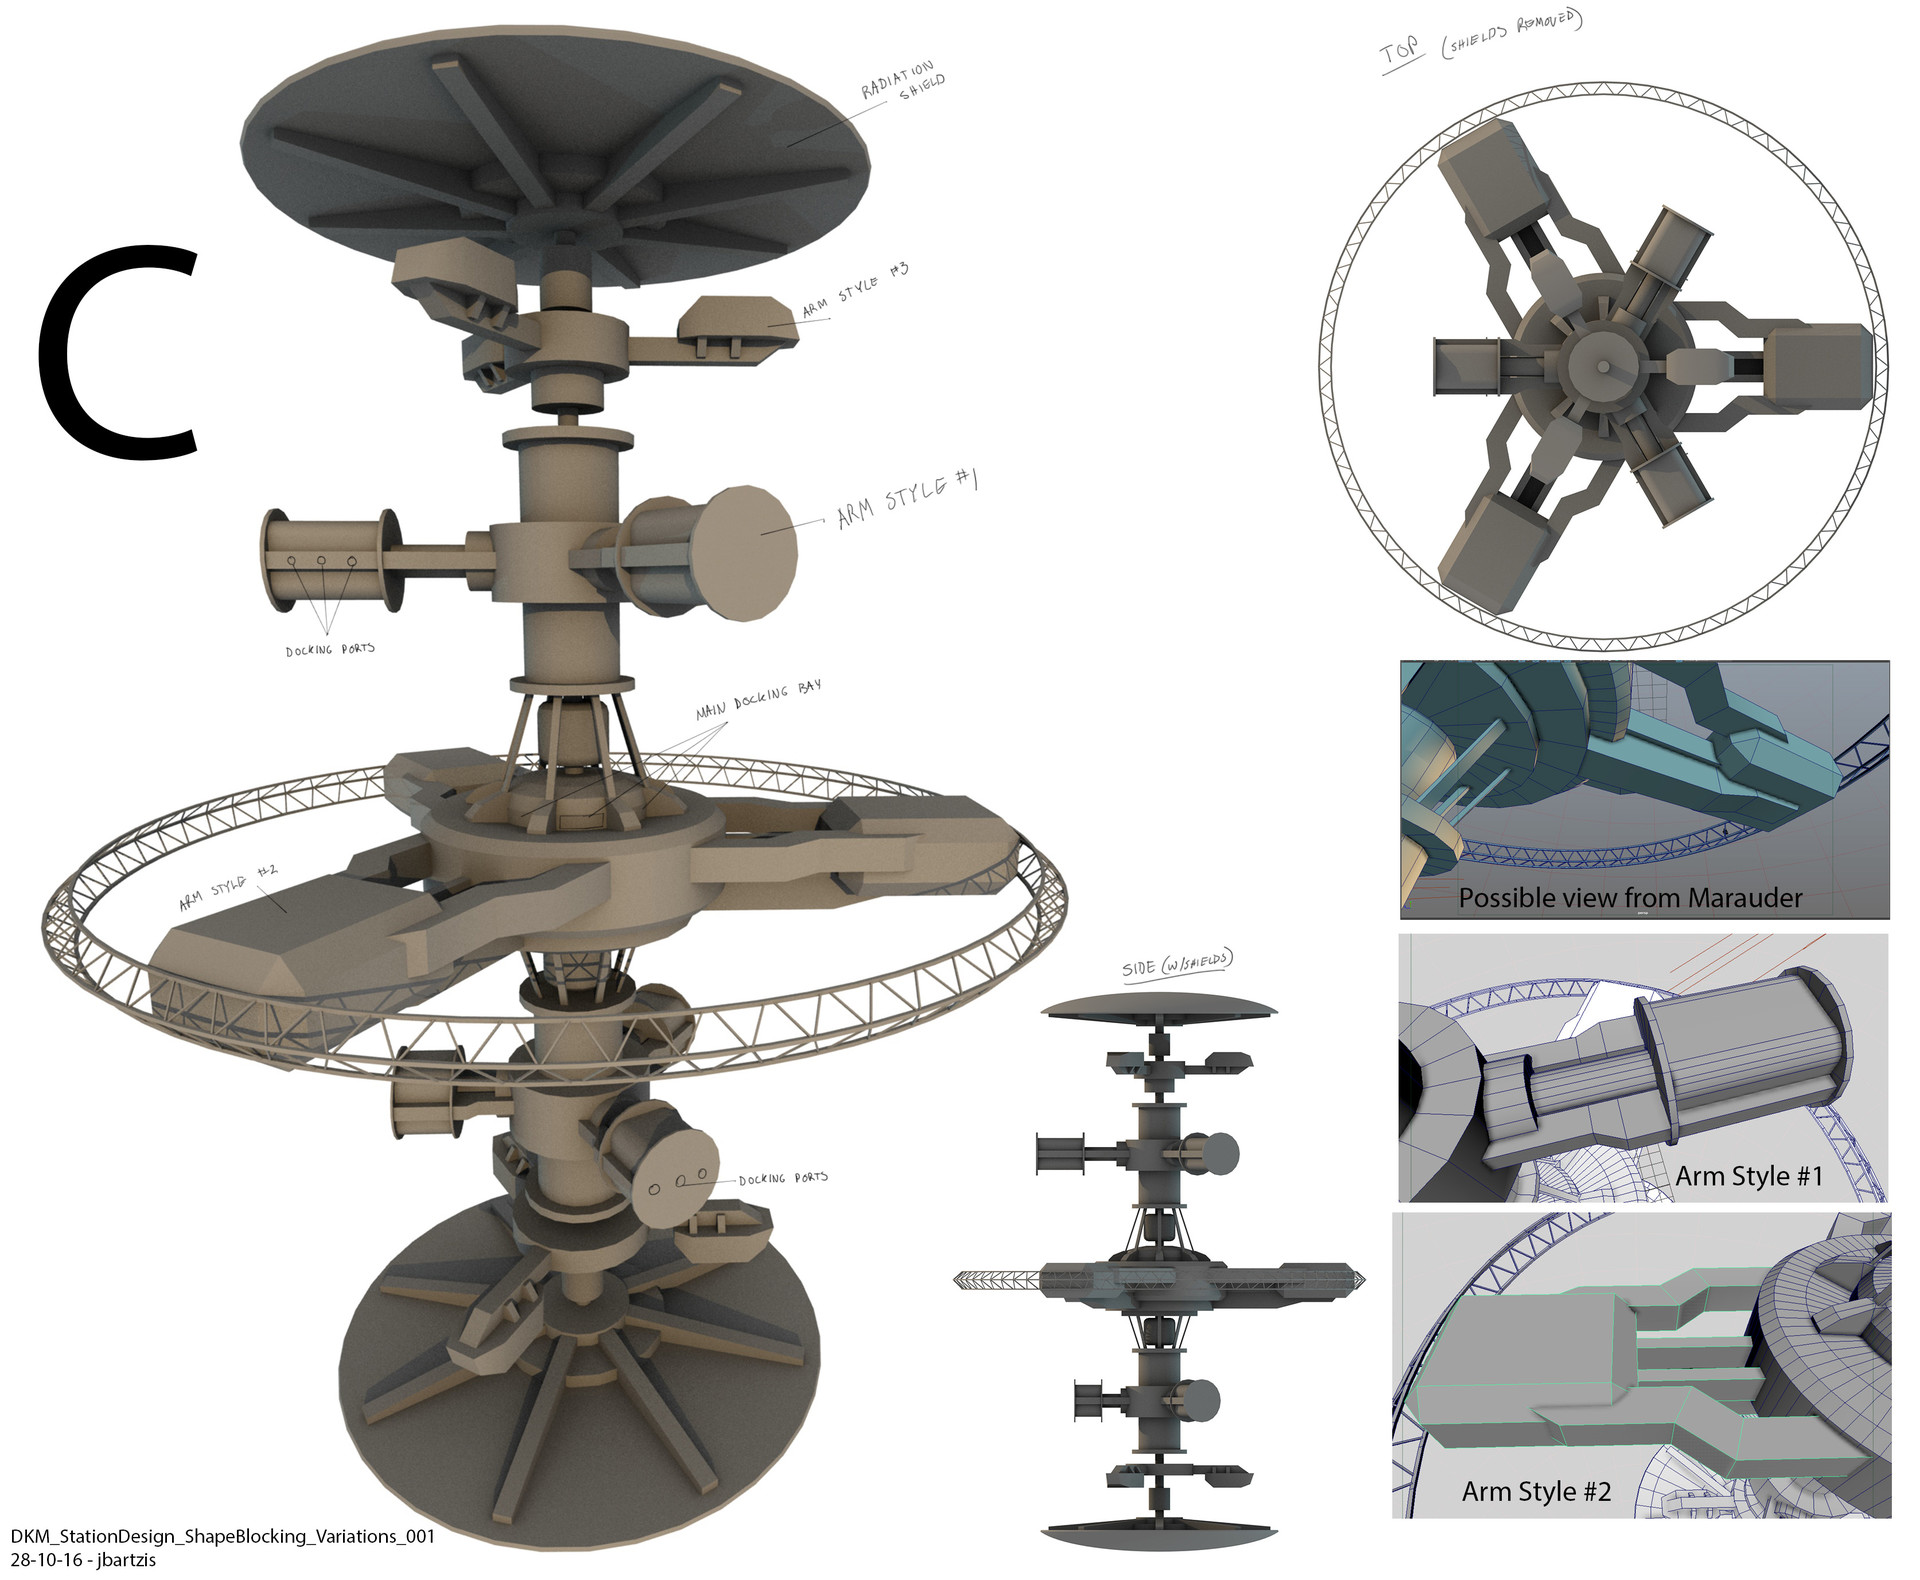 Jeff bartzis darkmatter stationdesign shapeblocking 001 c